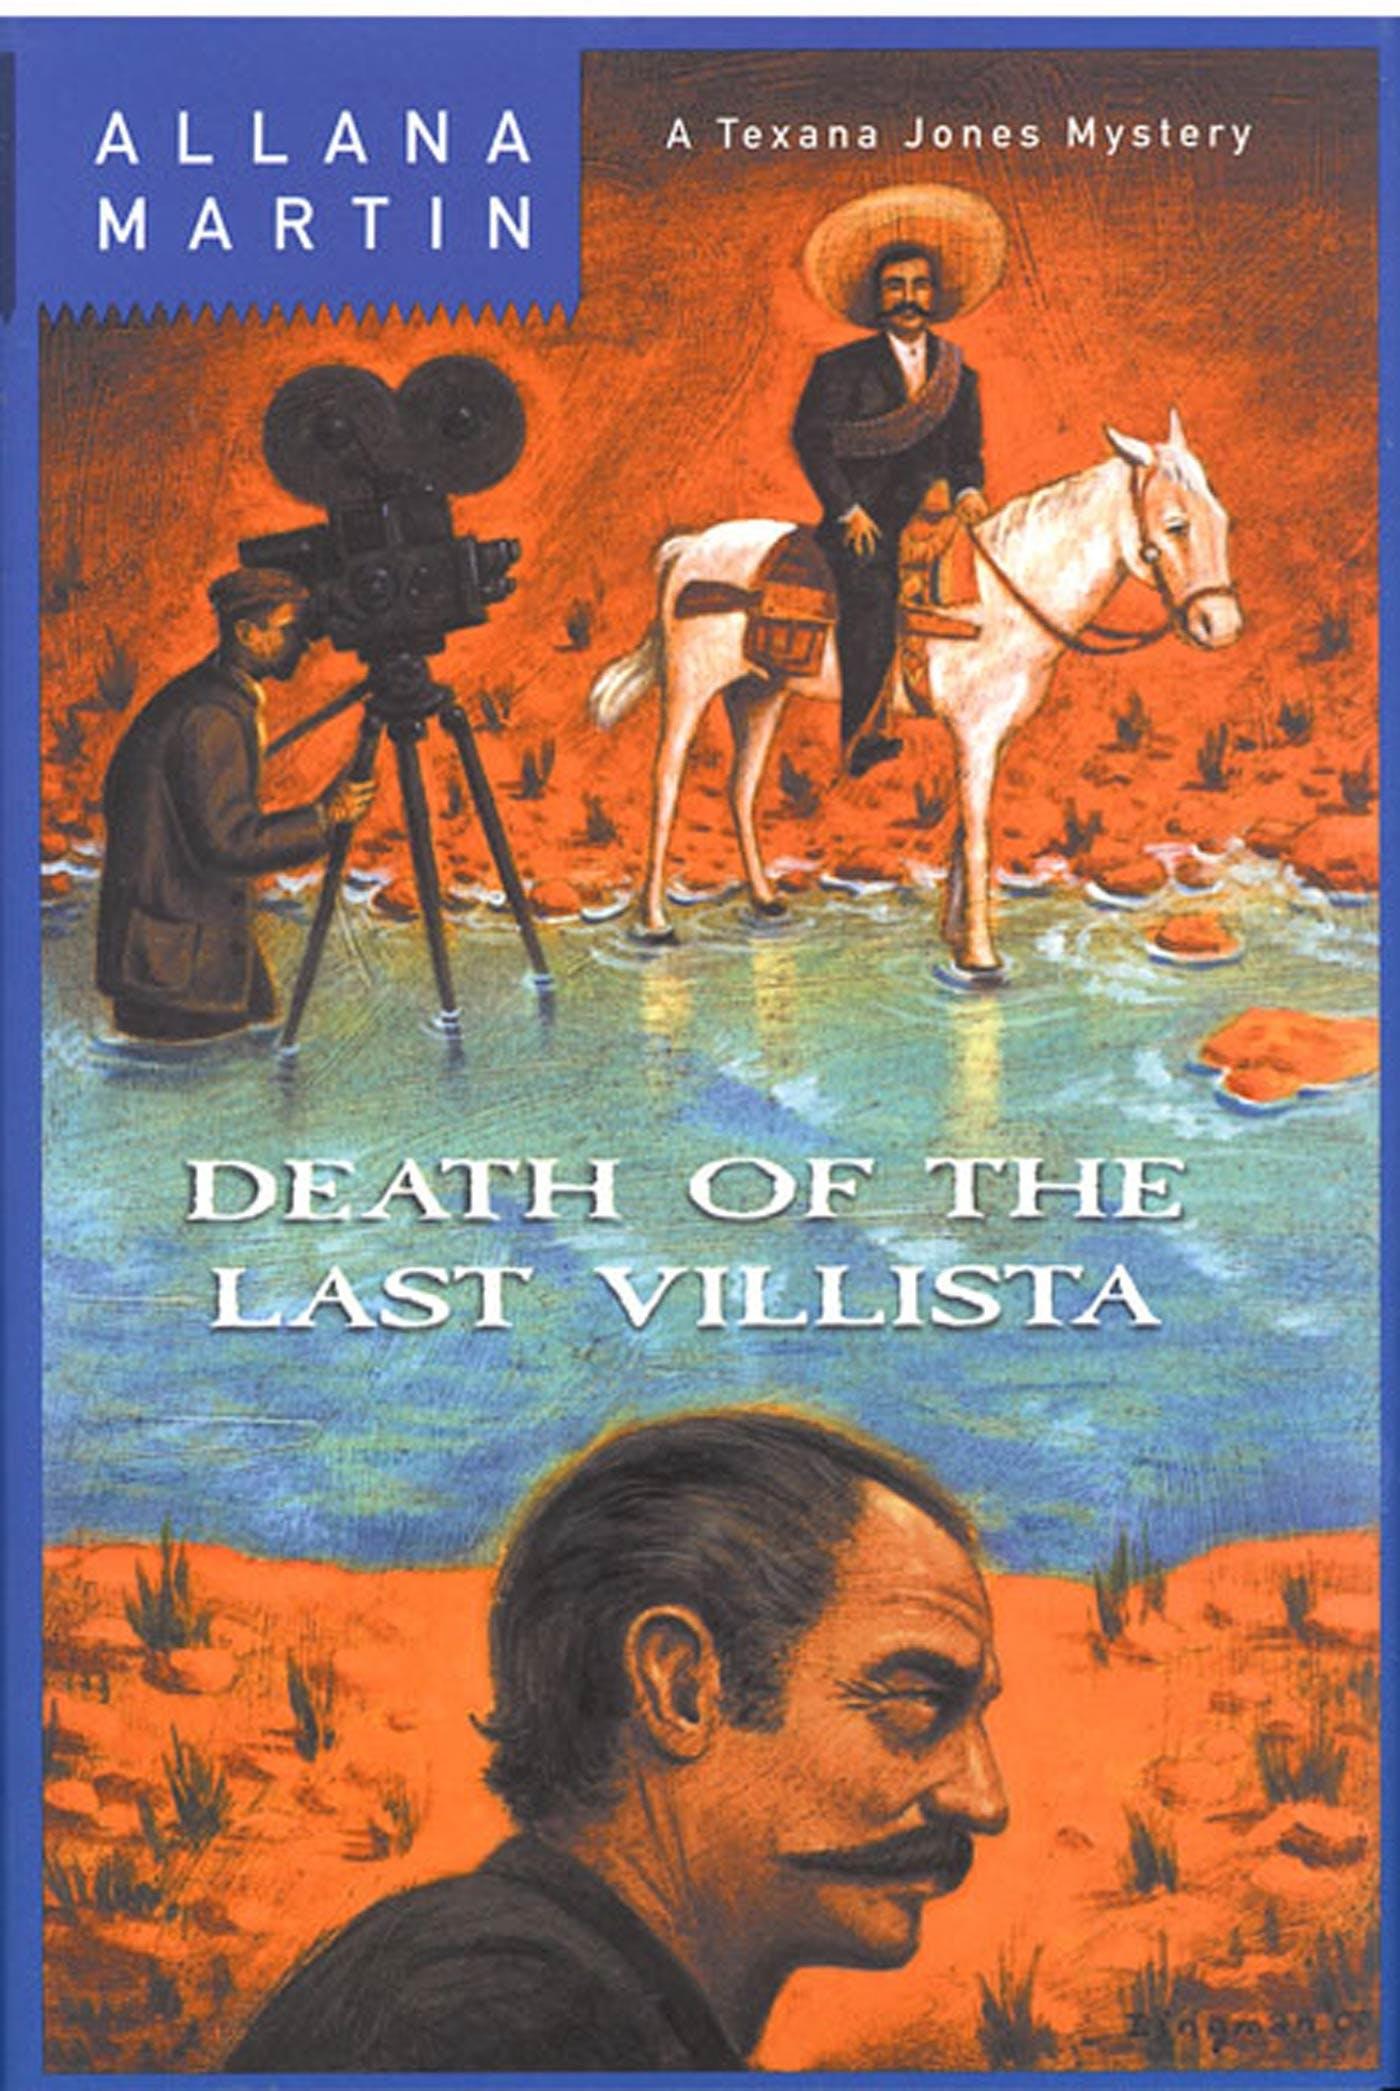 Image of Death of the Last Villista